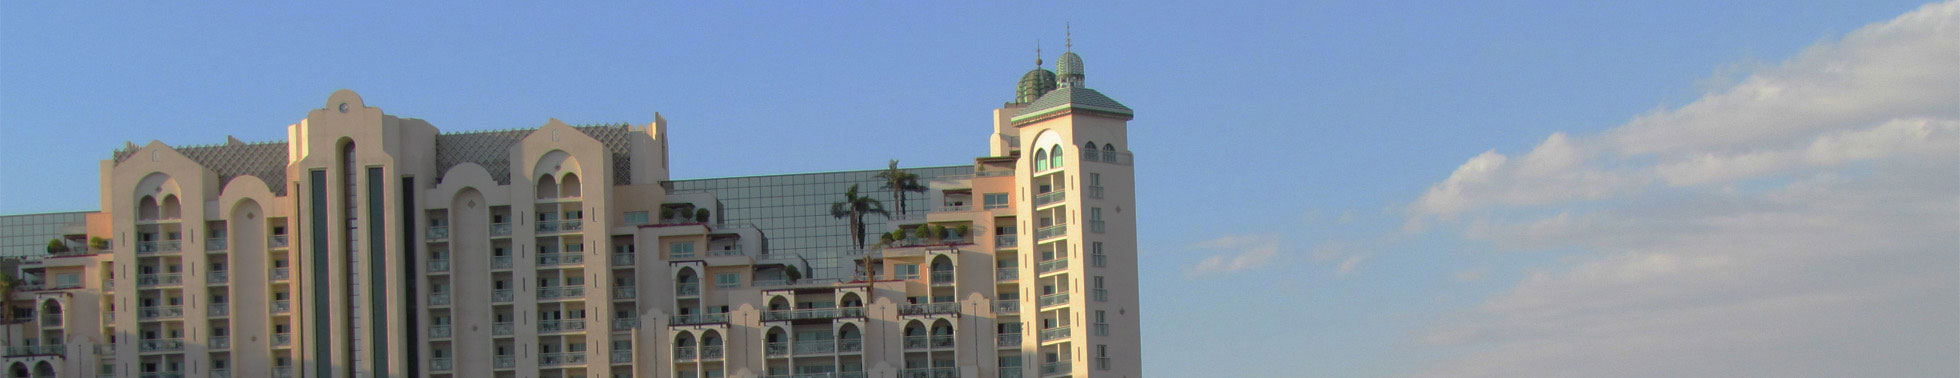 Israel Hotels Online